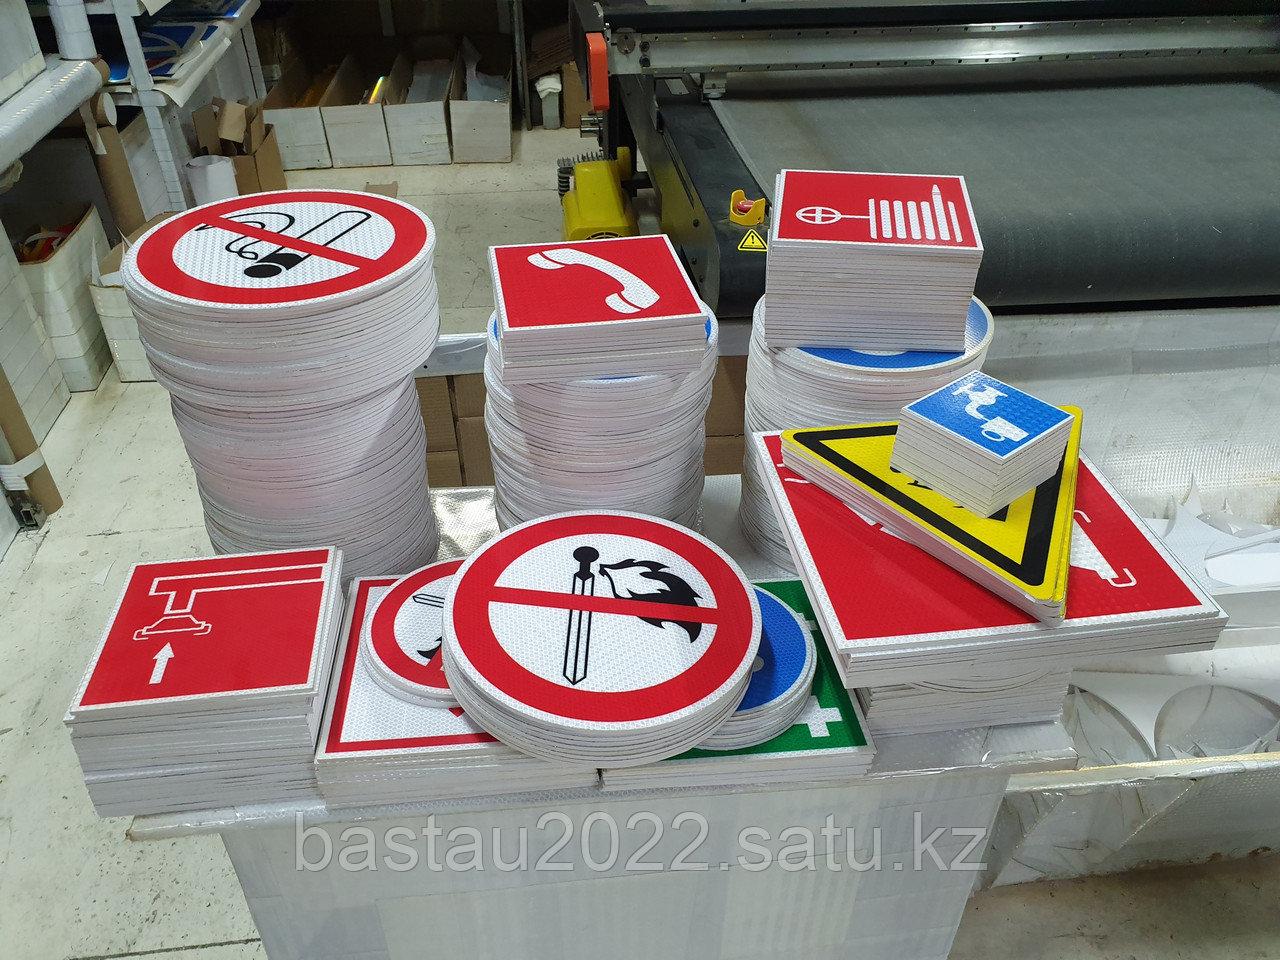 Таблички и знаки безопасности